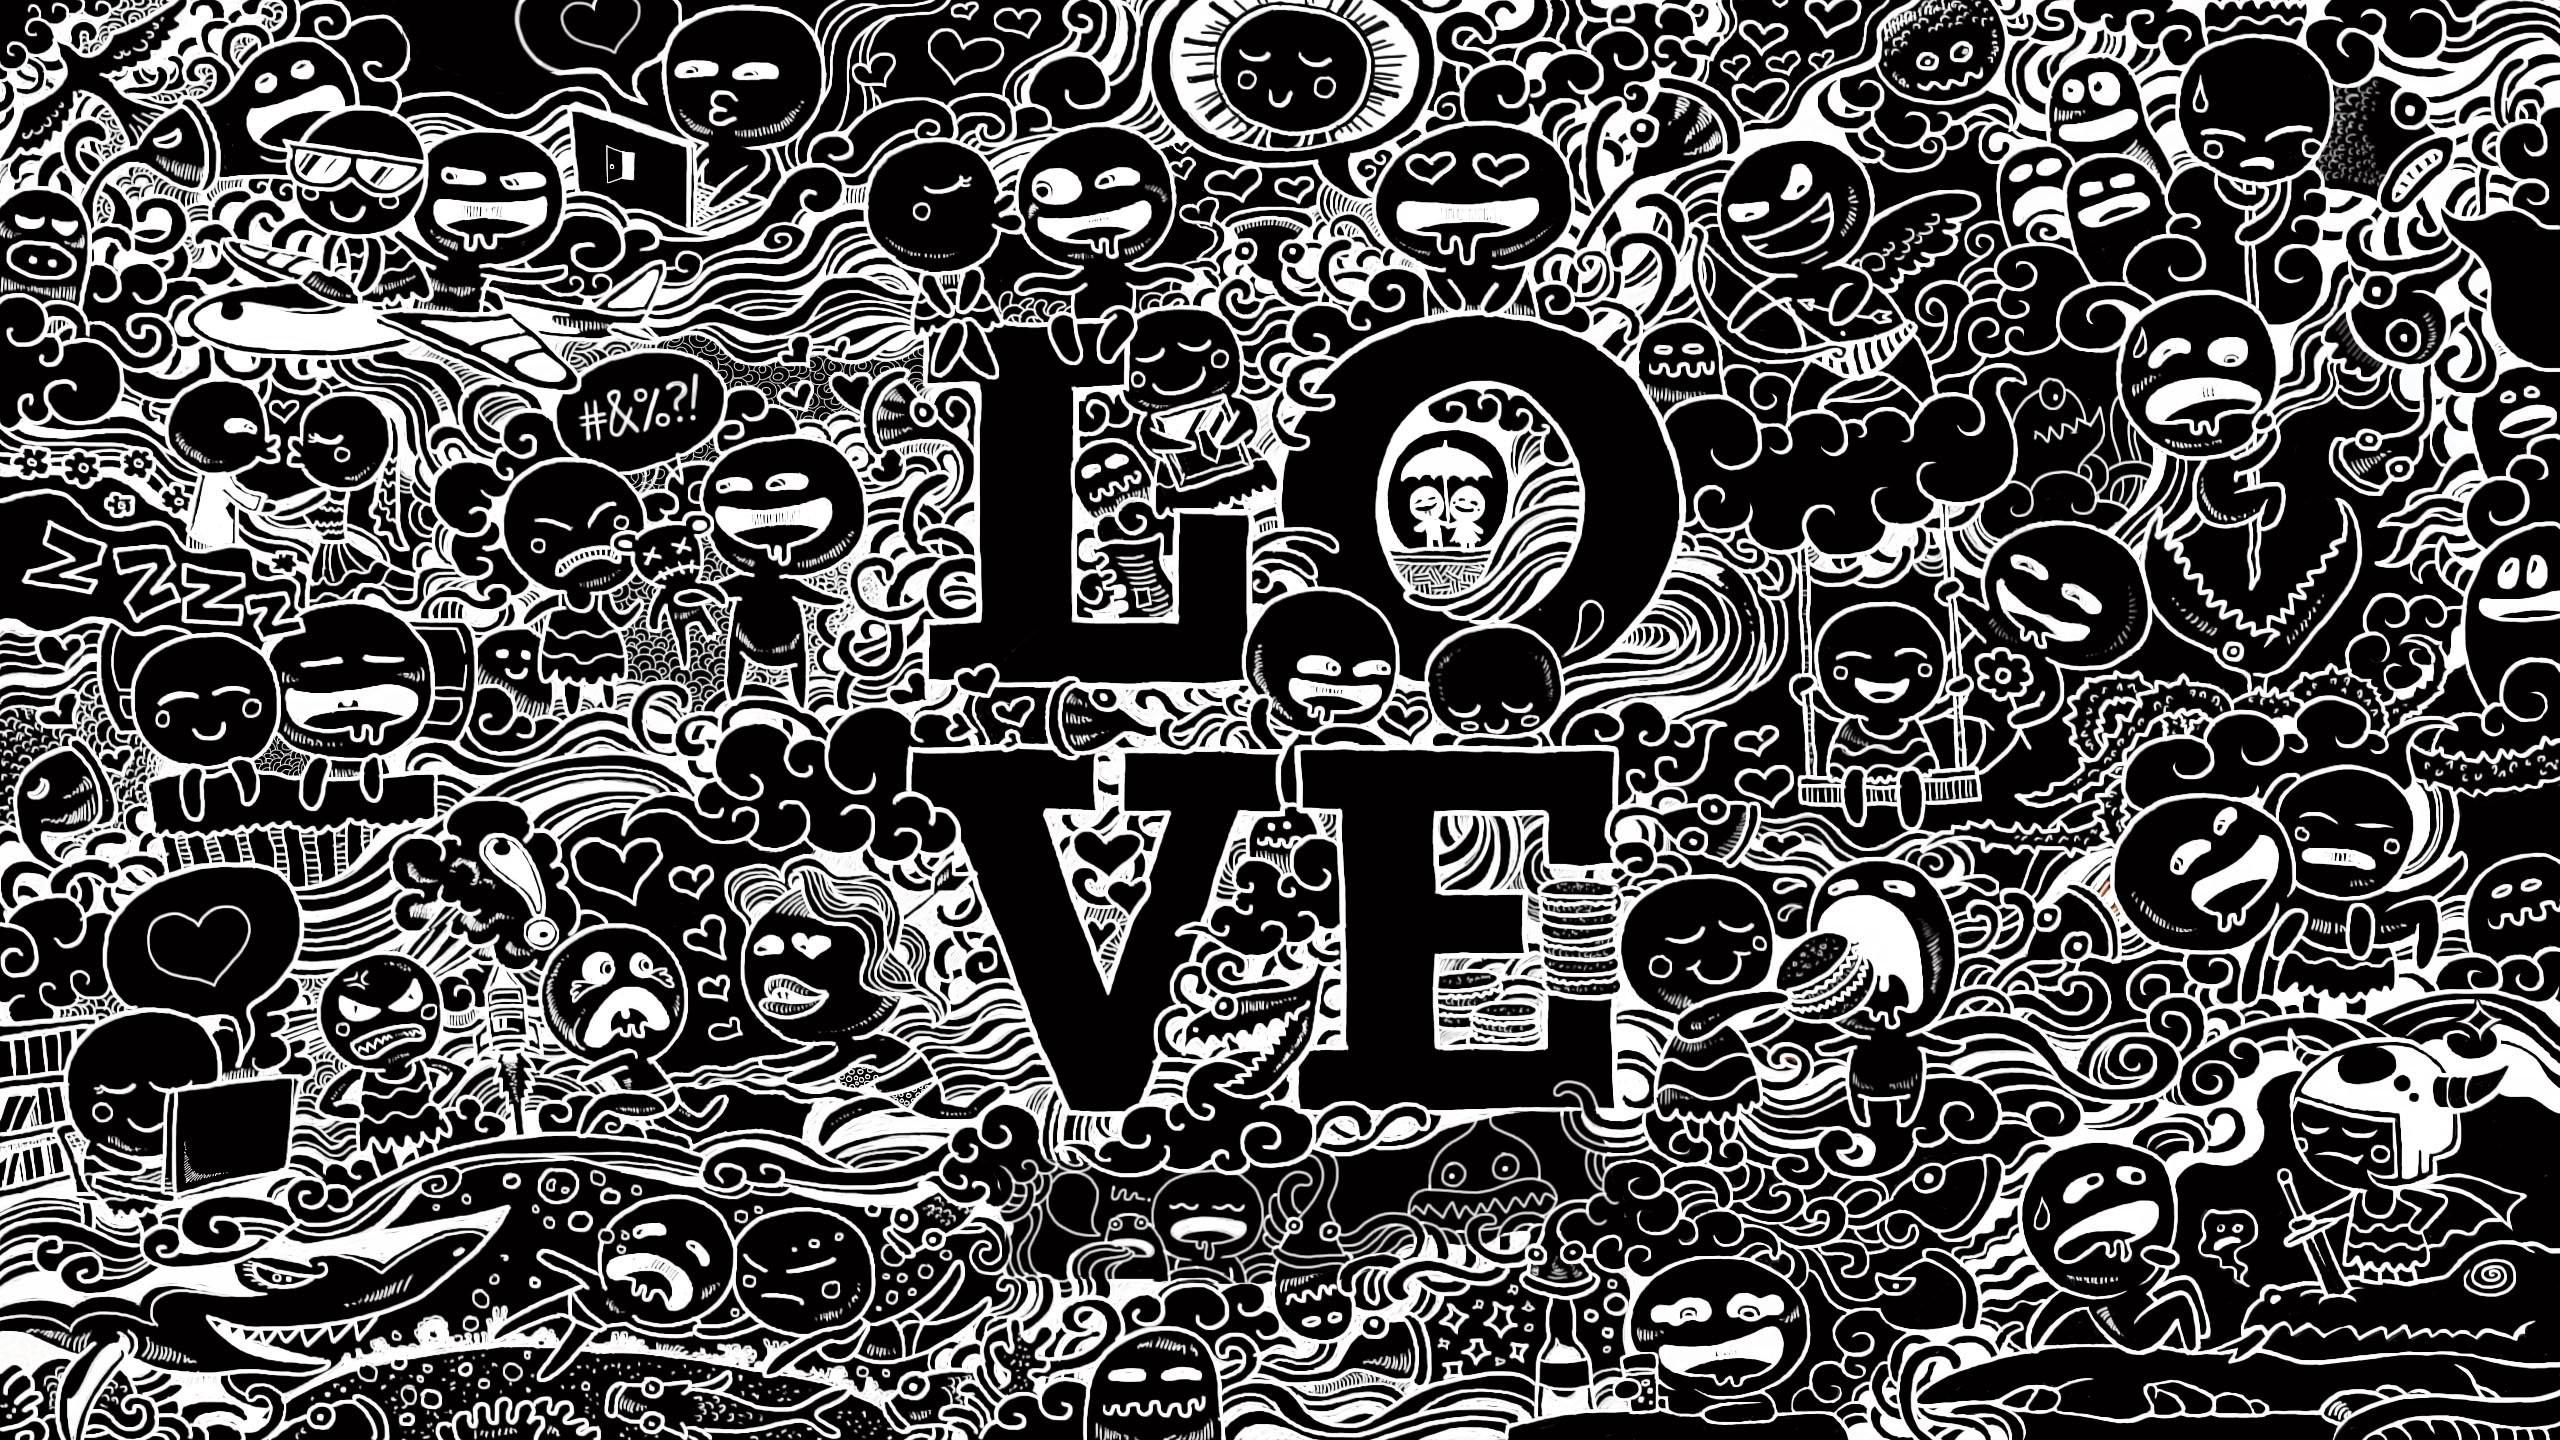 Download free doodle wallpaper.